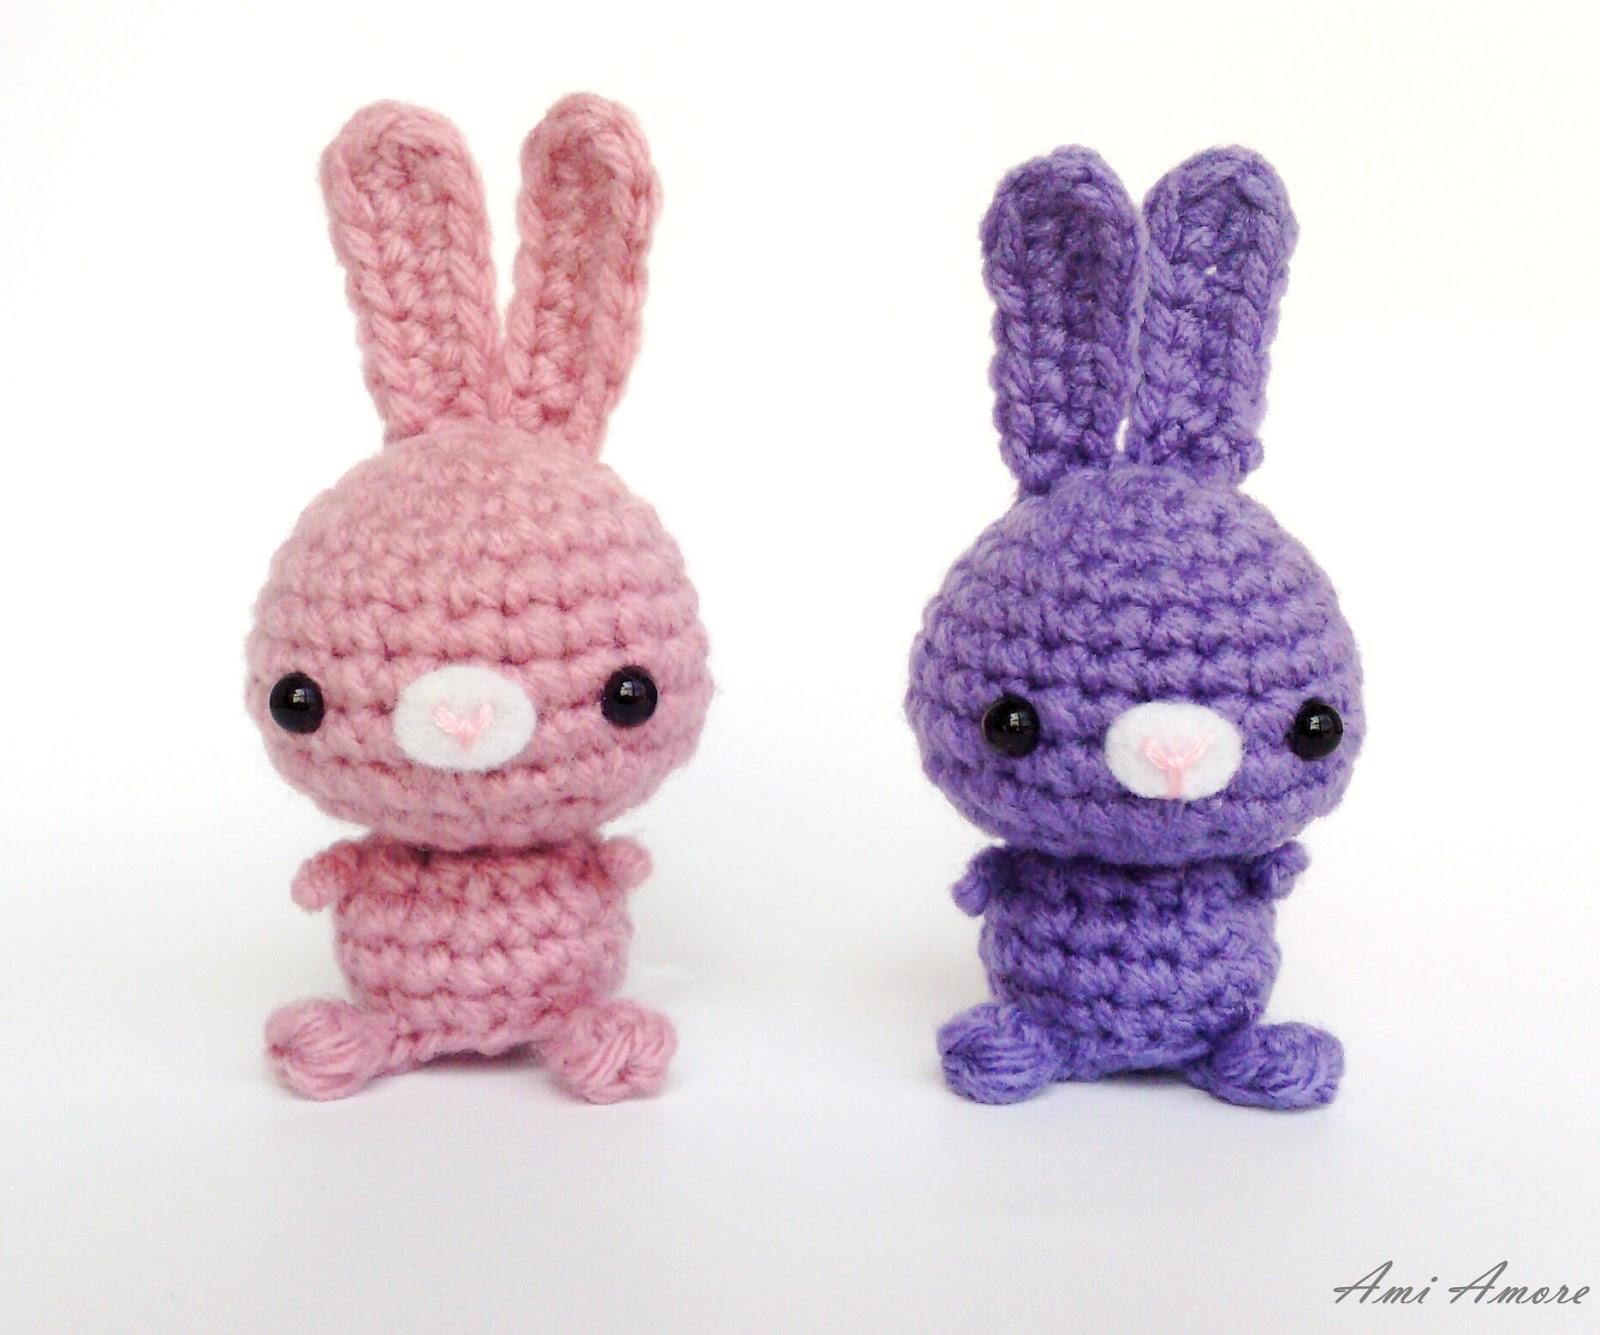 Ami Amore: New Amigurumi Designs and 4 Crochet Patterns